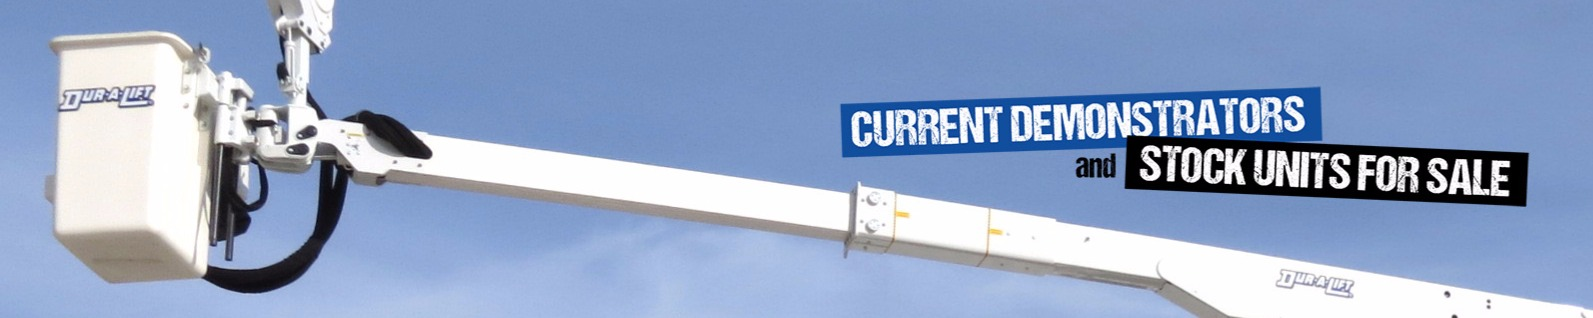 Dur A Lift Cranes For Sale And Rent Crane Market